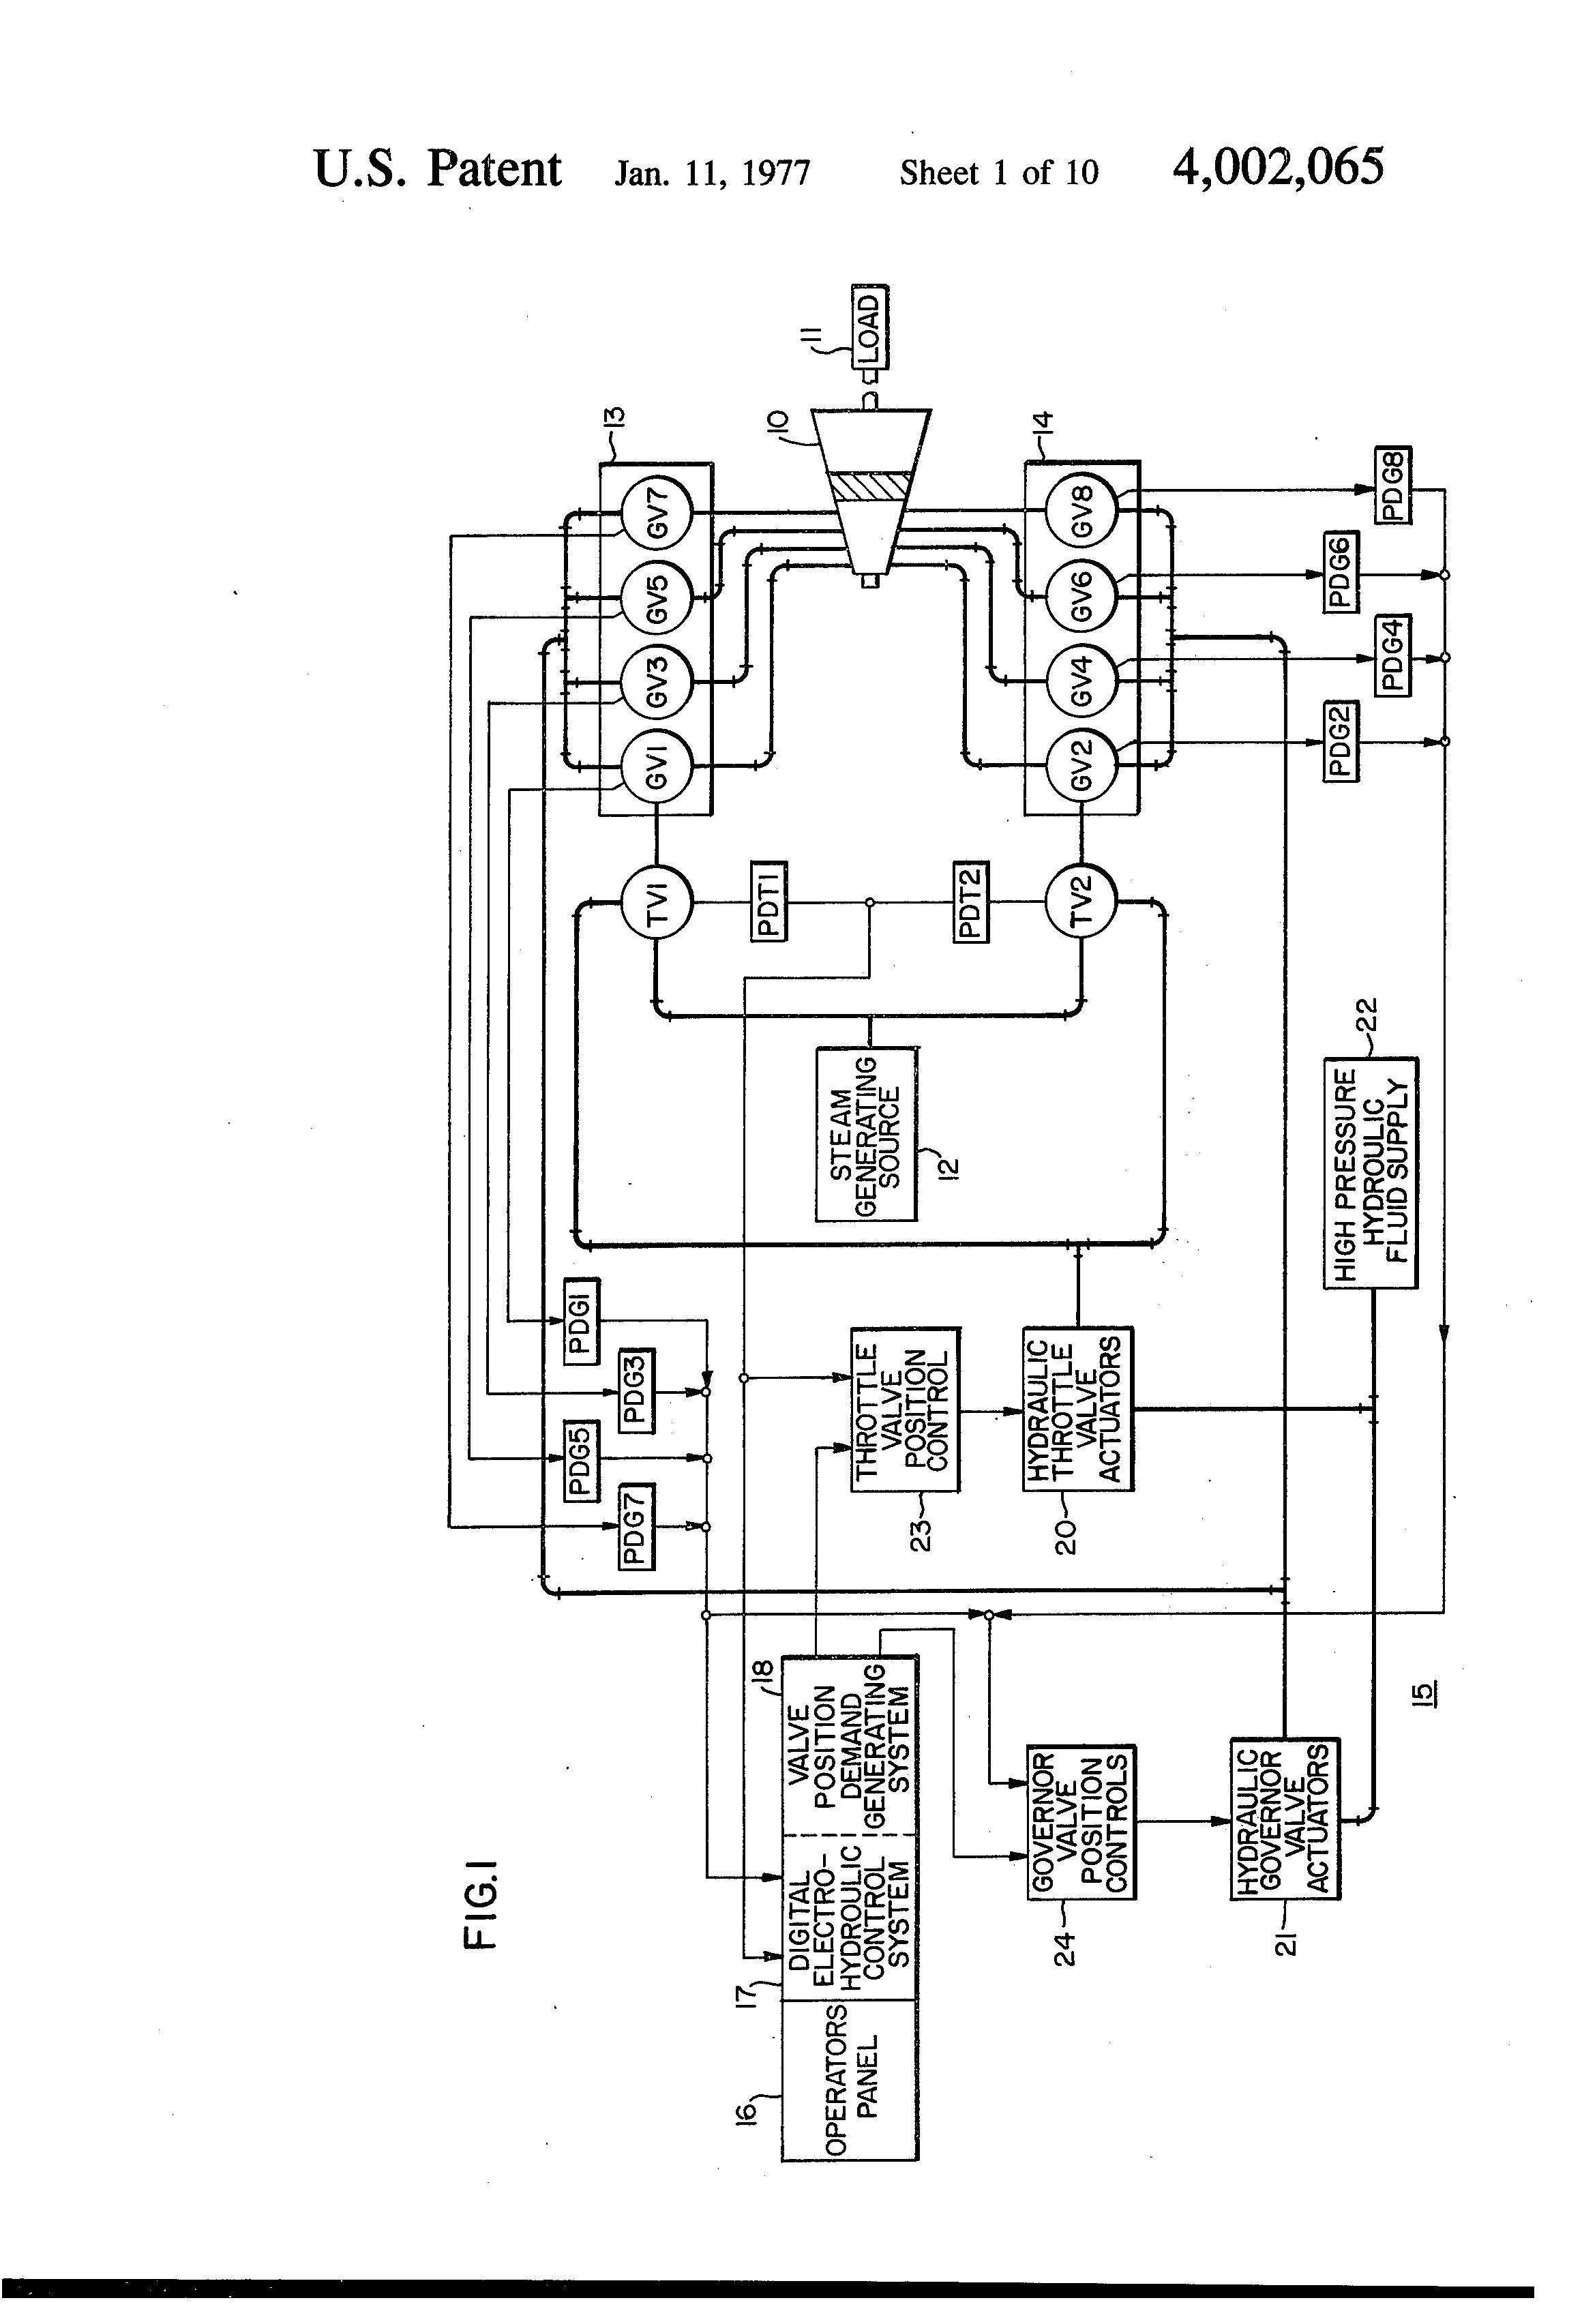 Patent US Steam turbine valve positioning system having